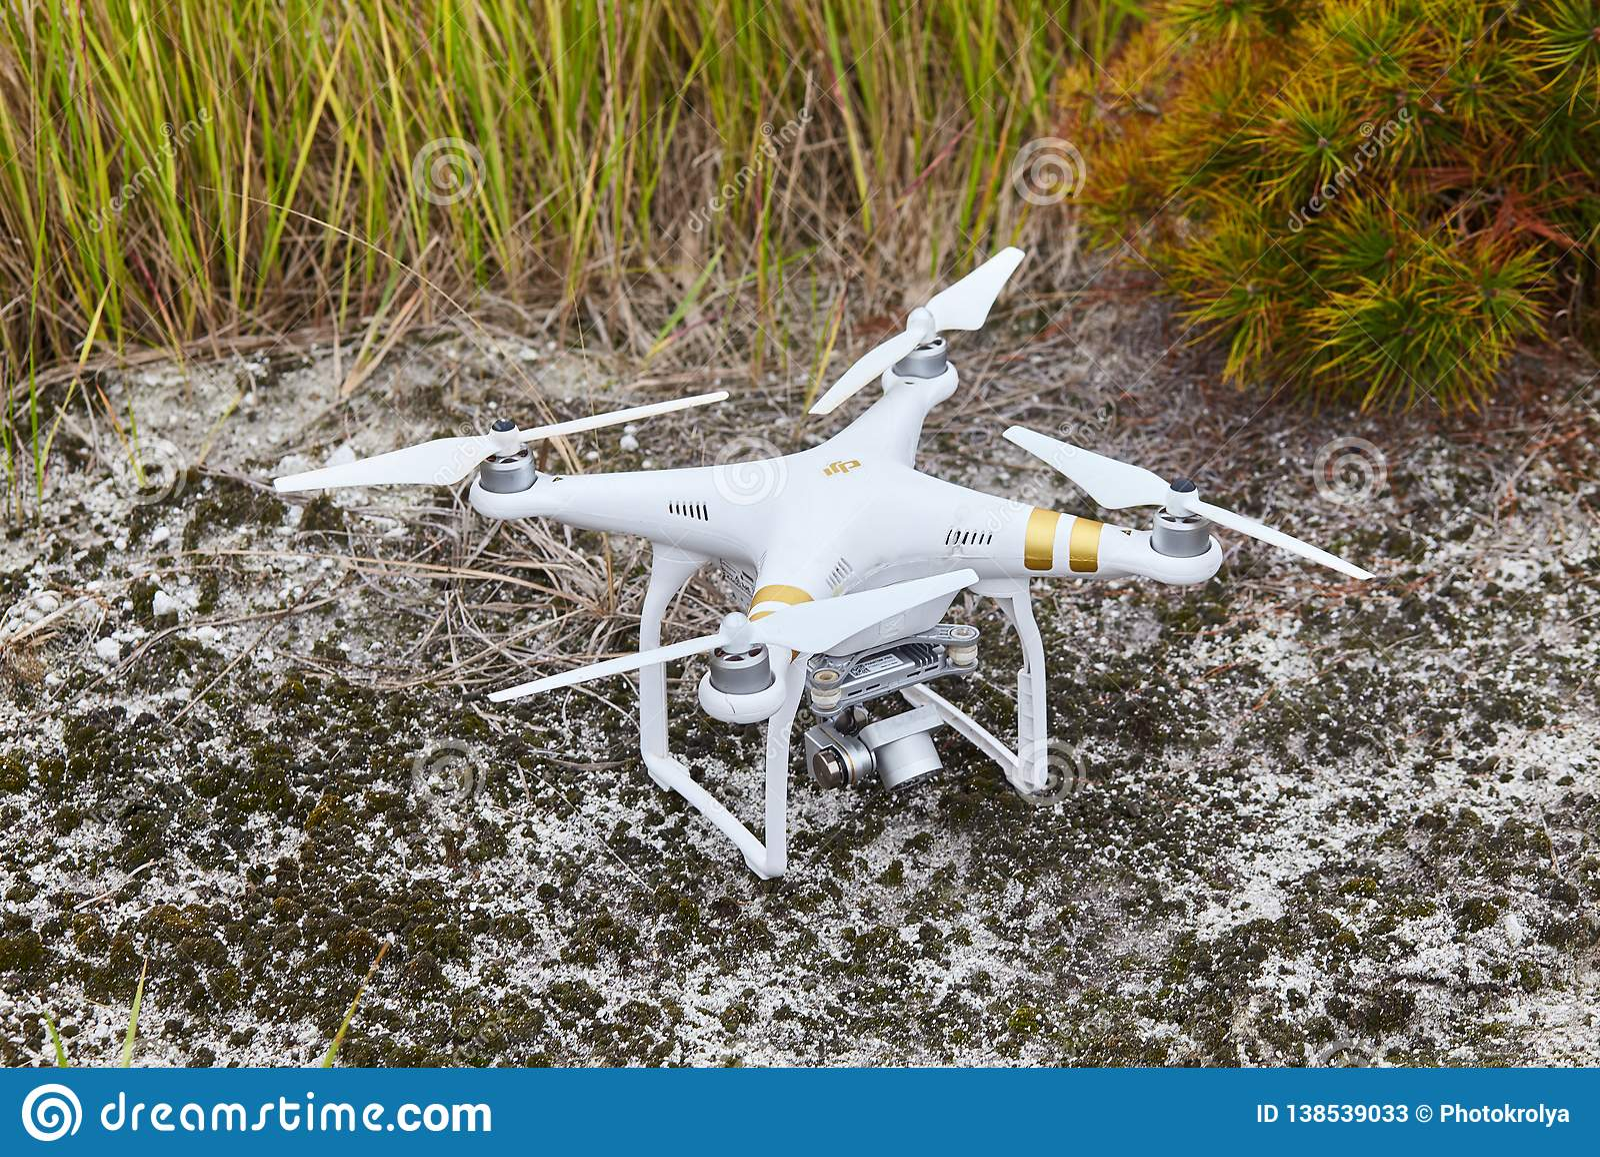 Drone quadrocopter Phantom PRO Professional with high resolution digital camera